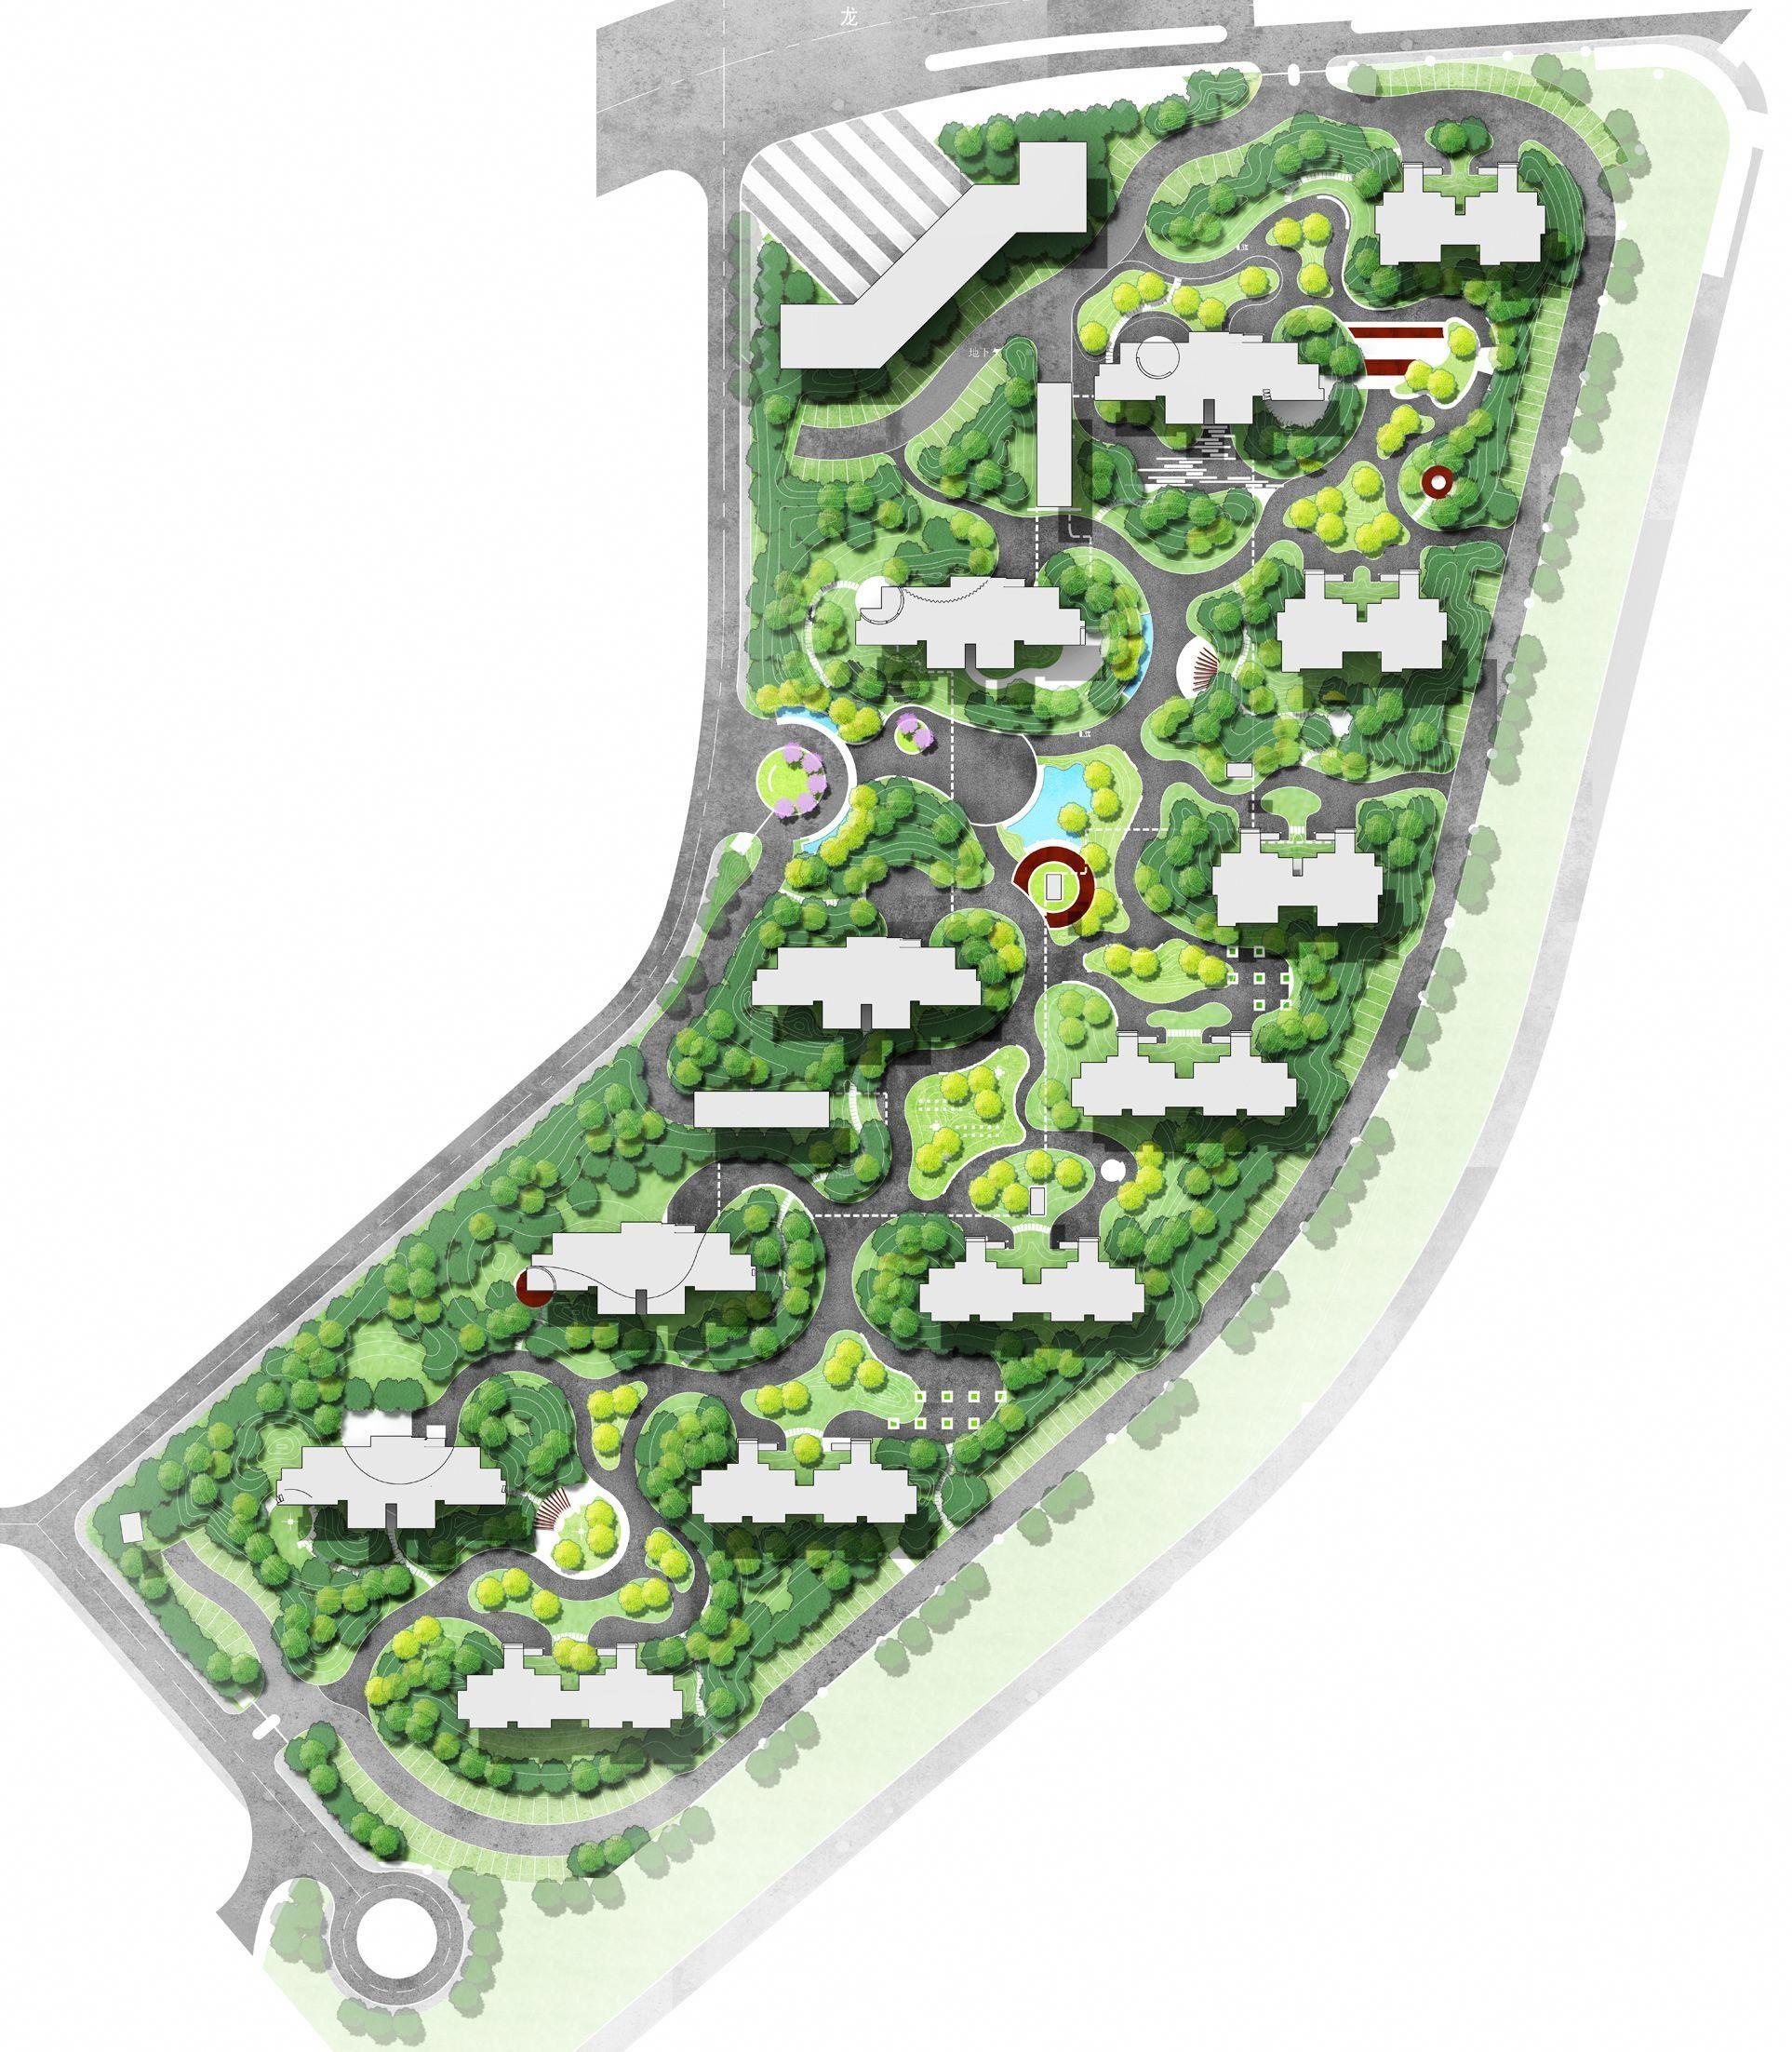 Pin On Urban Design